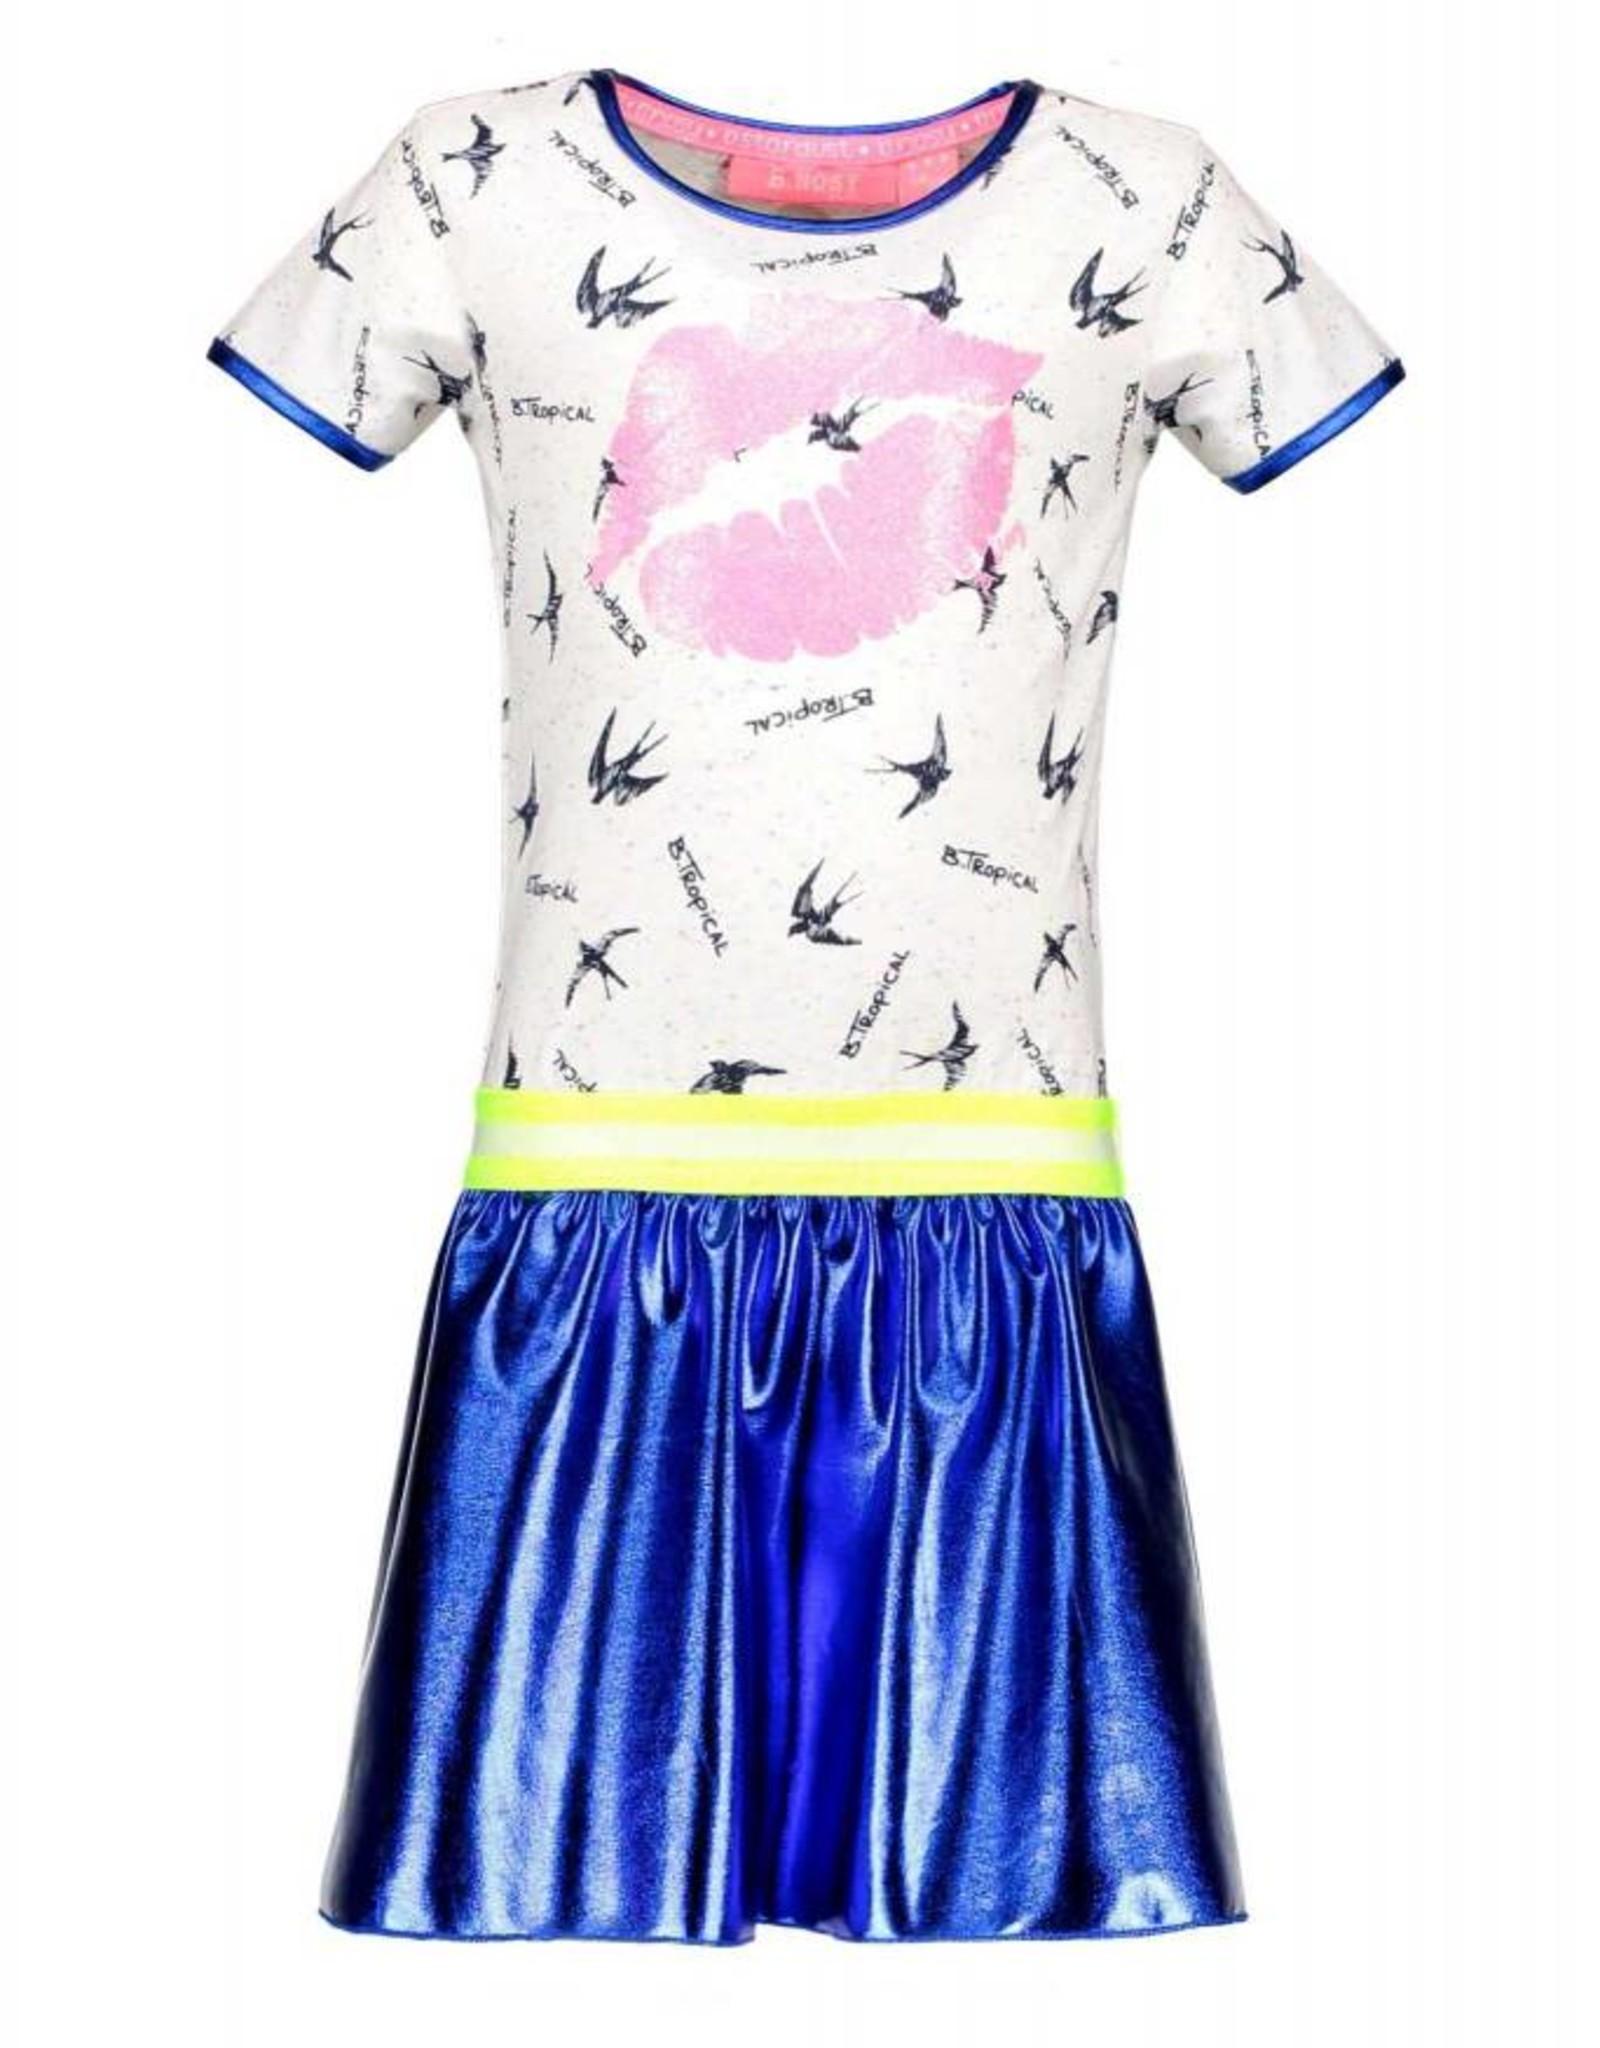 B. Nosy Girls bird dress with coated skirt